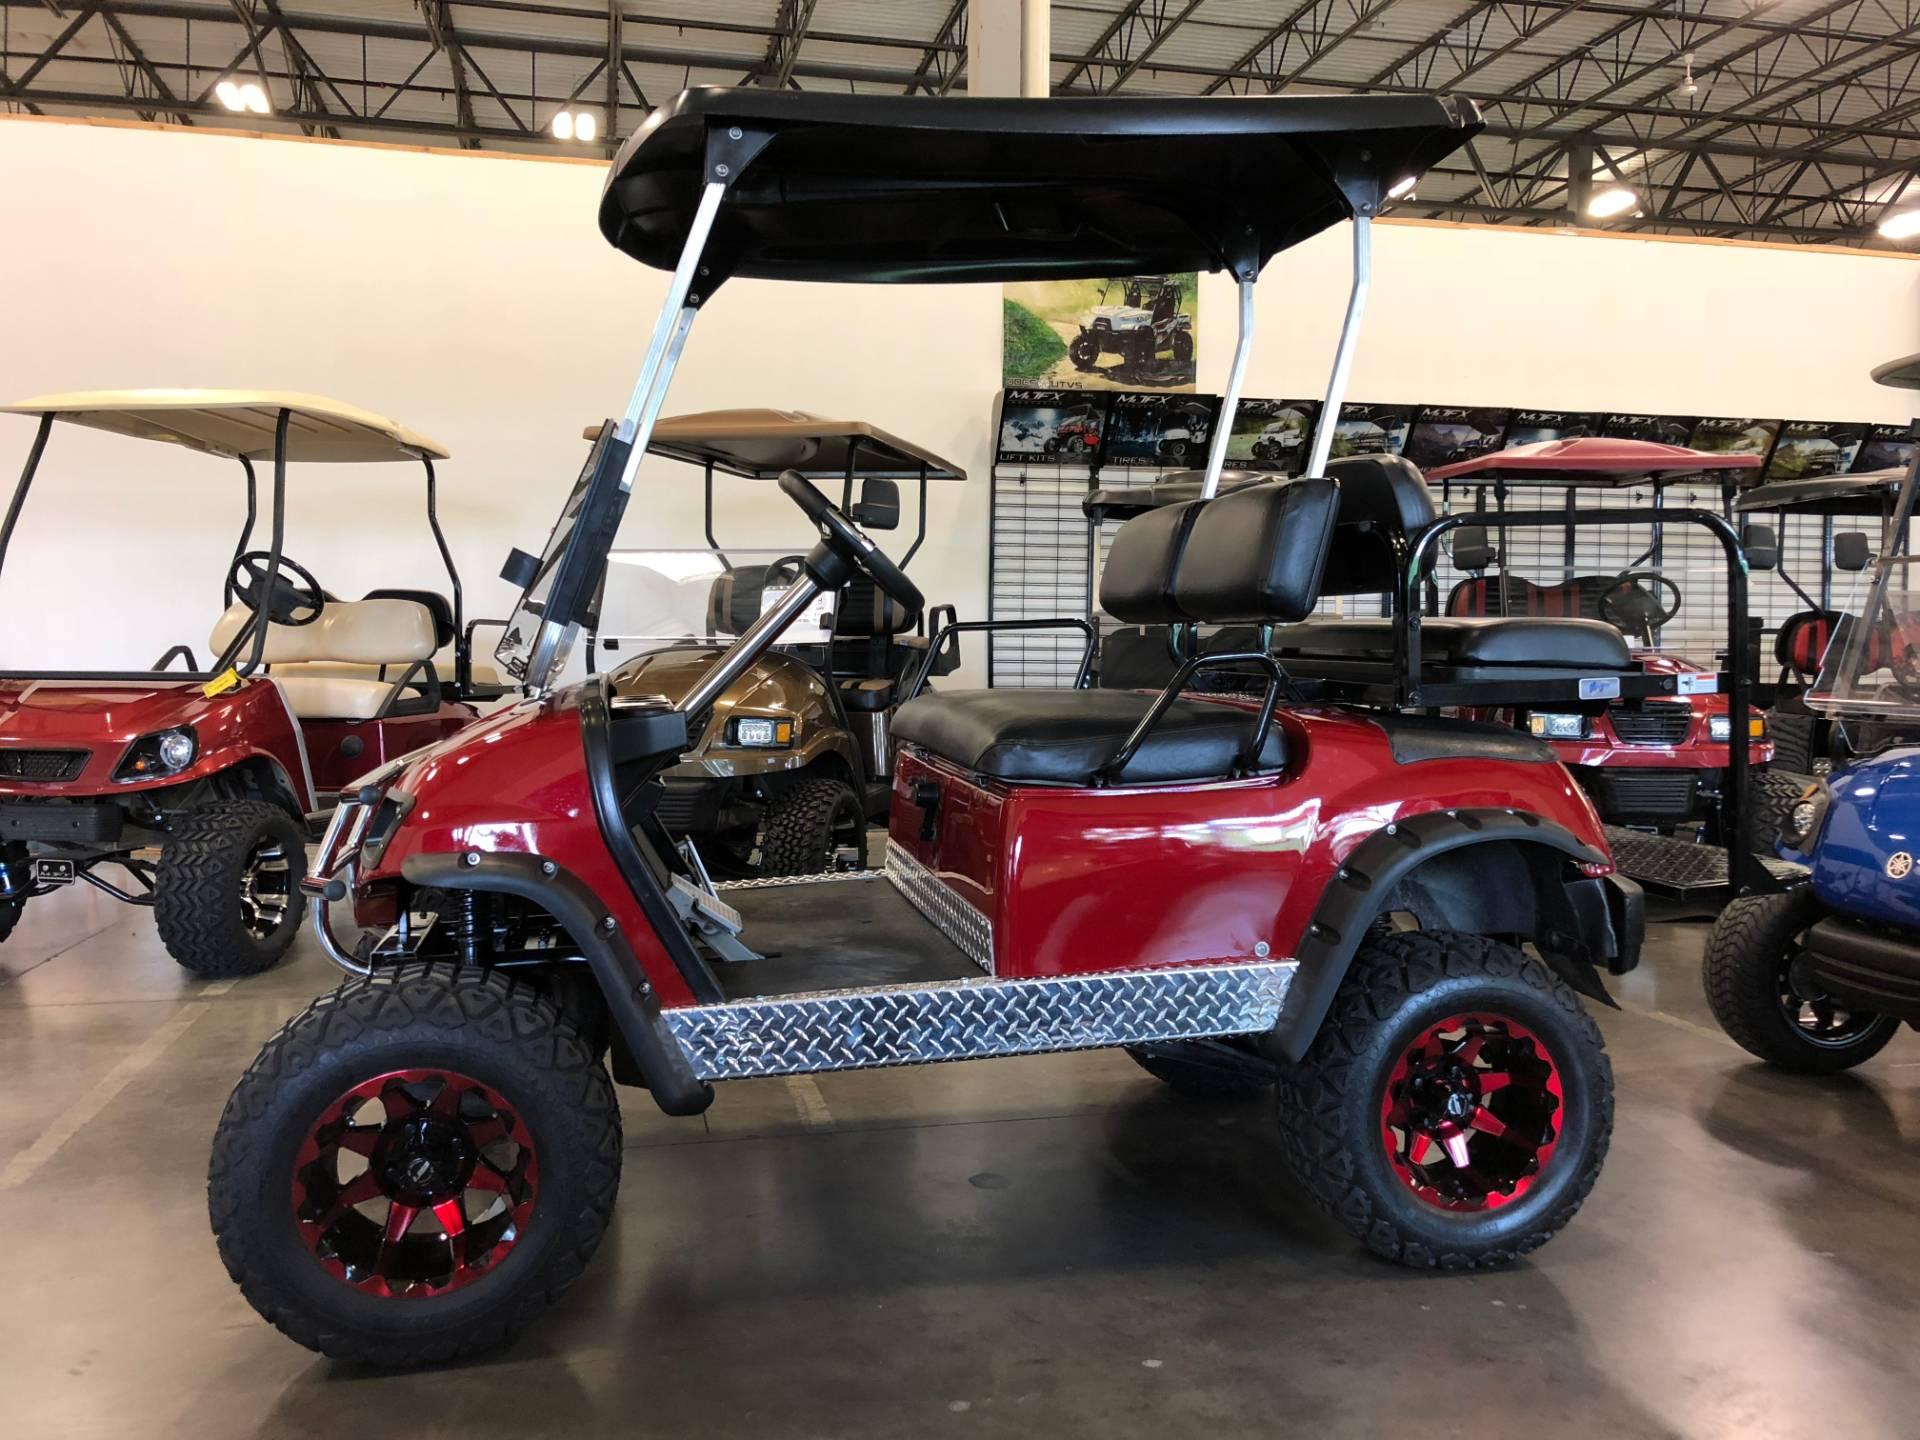 2004 Yamaha G22 Golf Carts Otsego Minnesota 100369 on